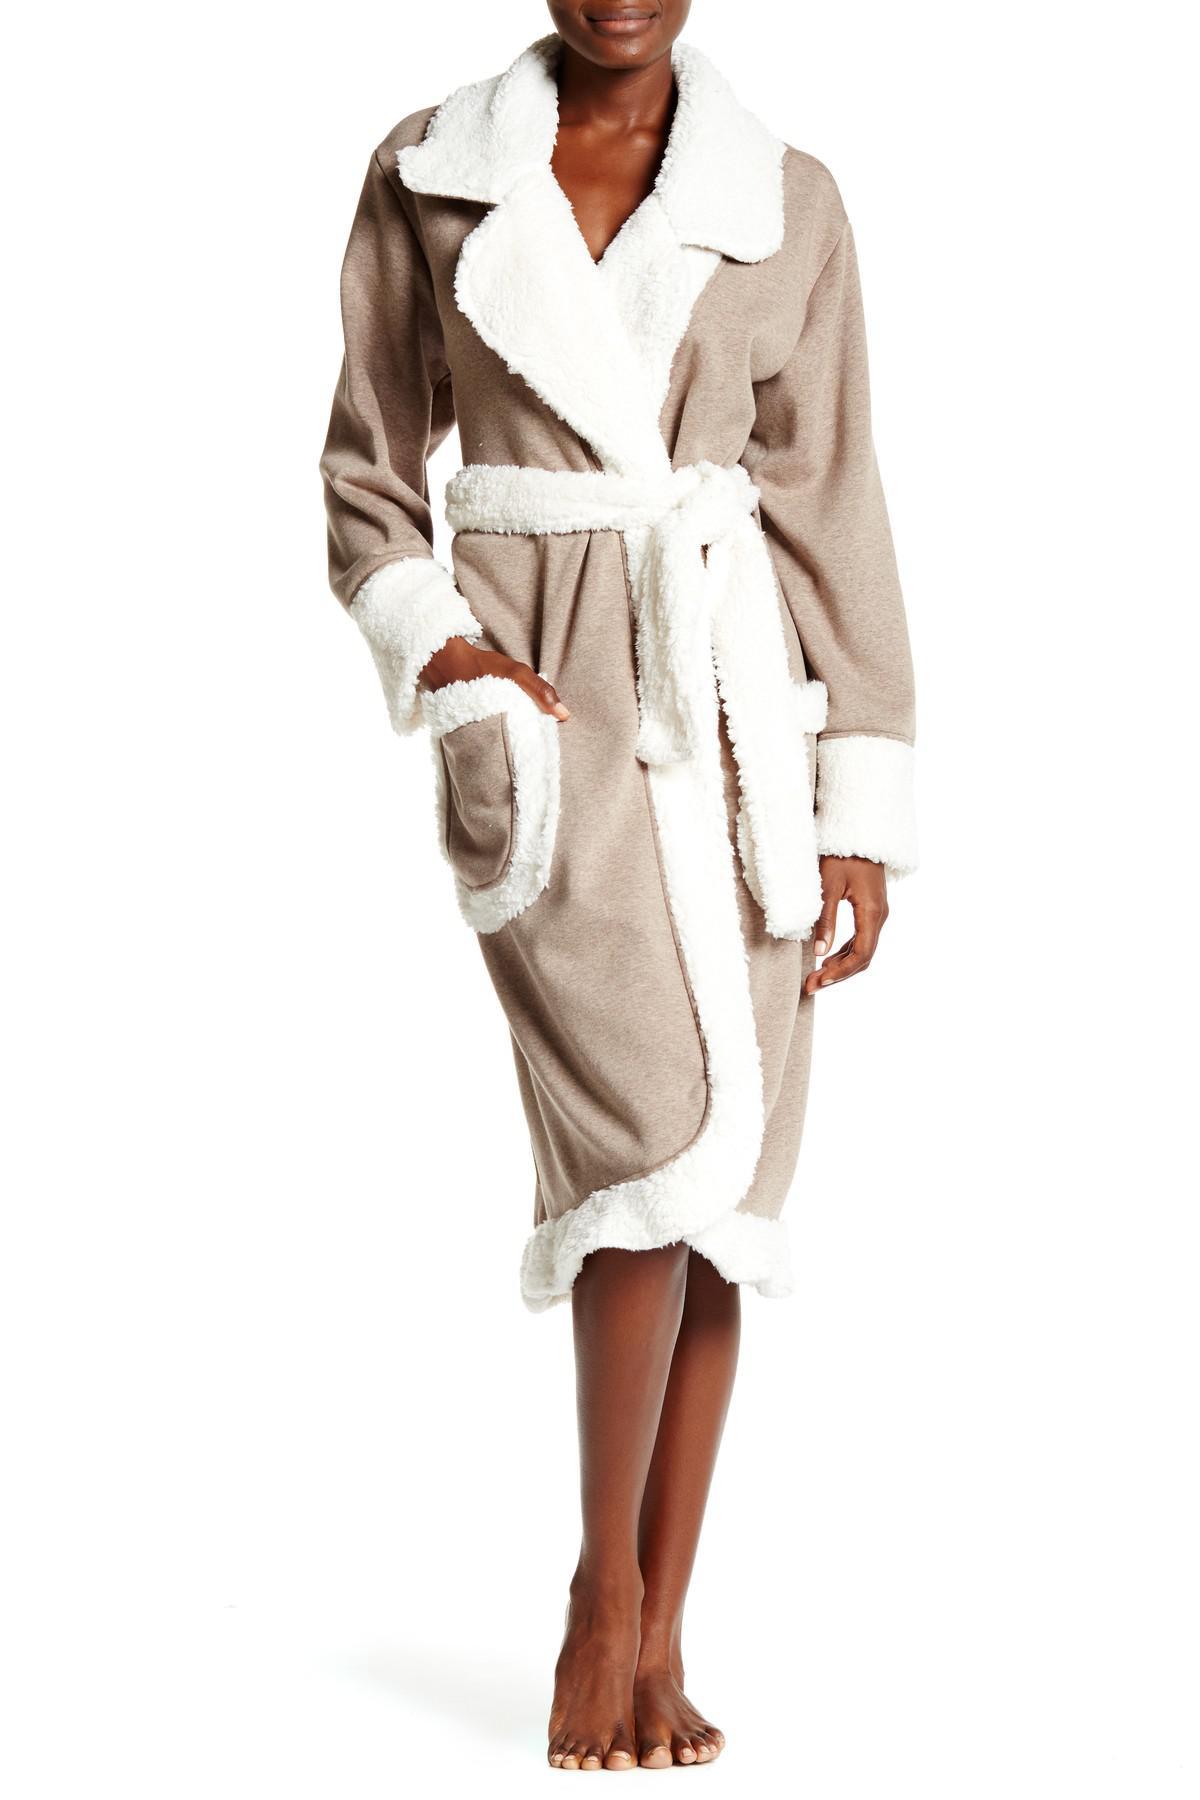 Lyst - UGG Duffield Deluxe Fleece Robe 74a8c958d